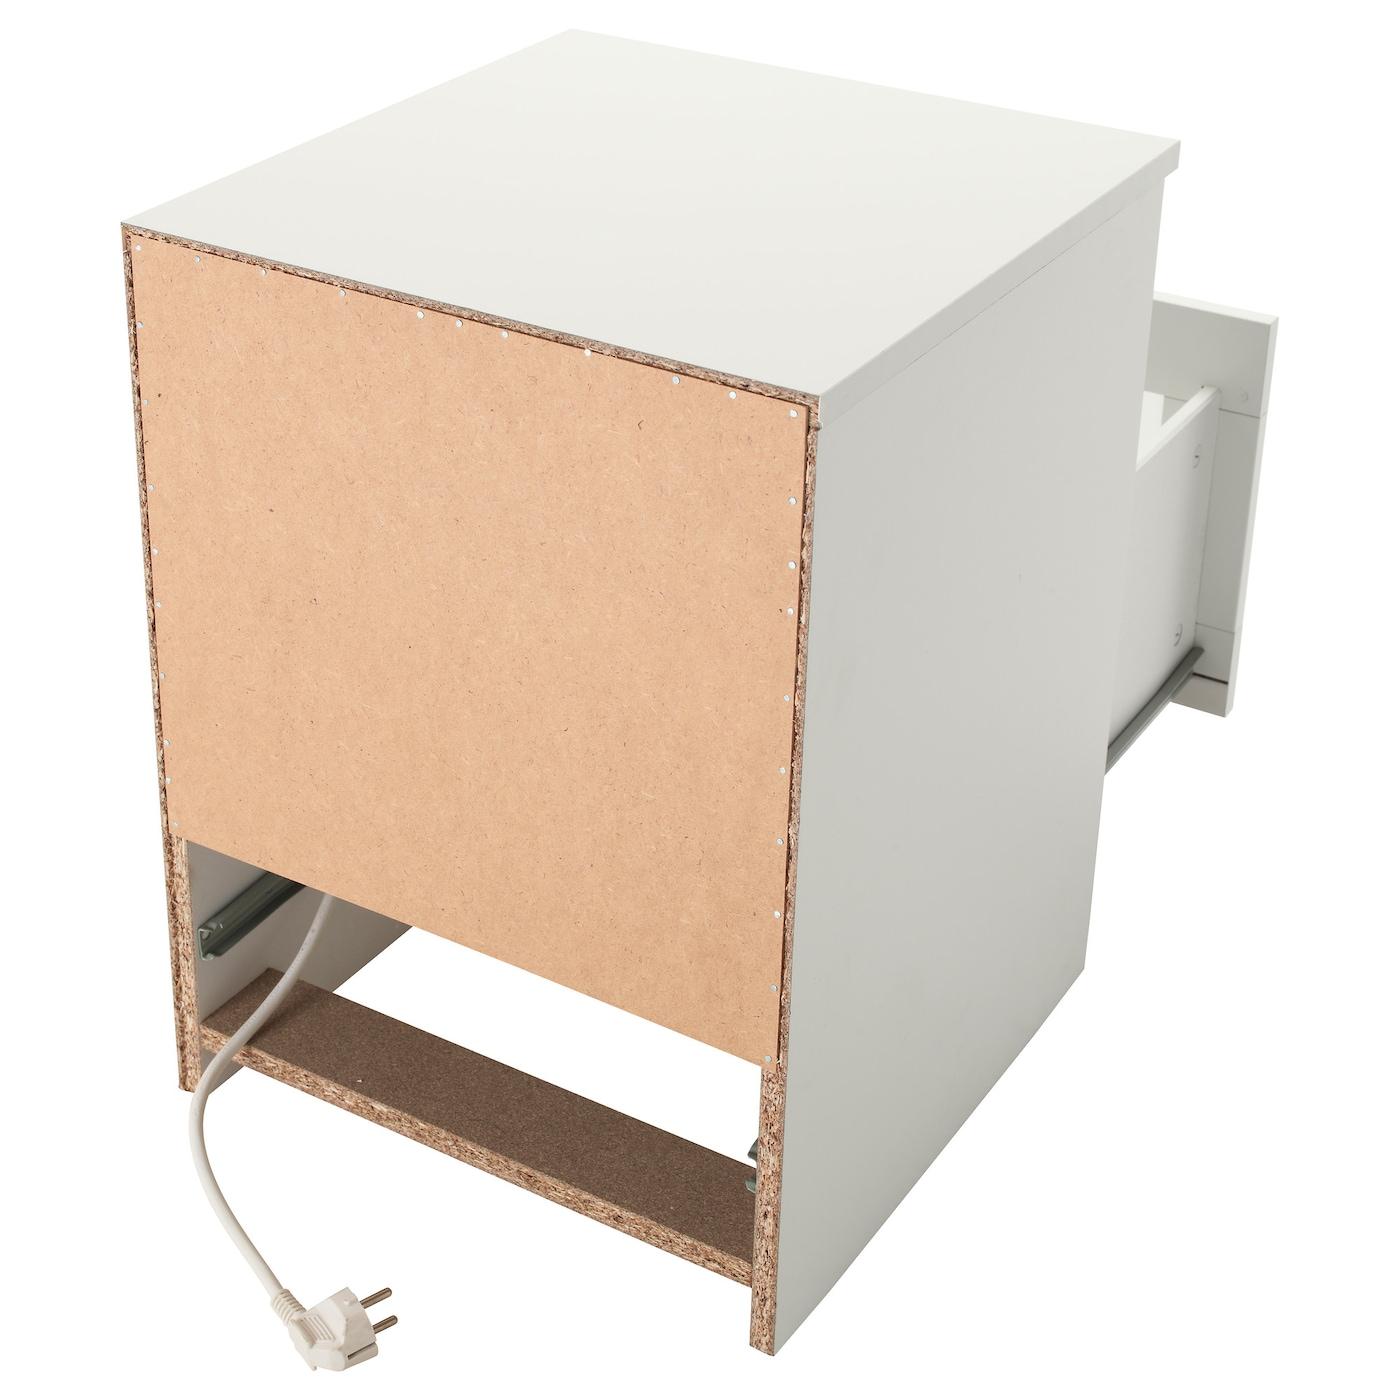 BRIMNES Nachtkastje Wit 39×41 cm IKEA